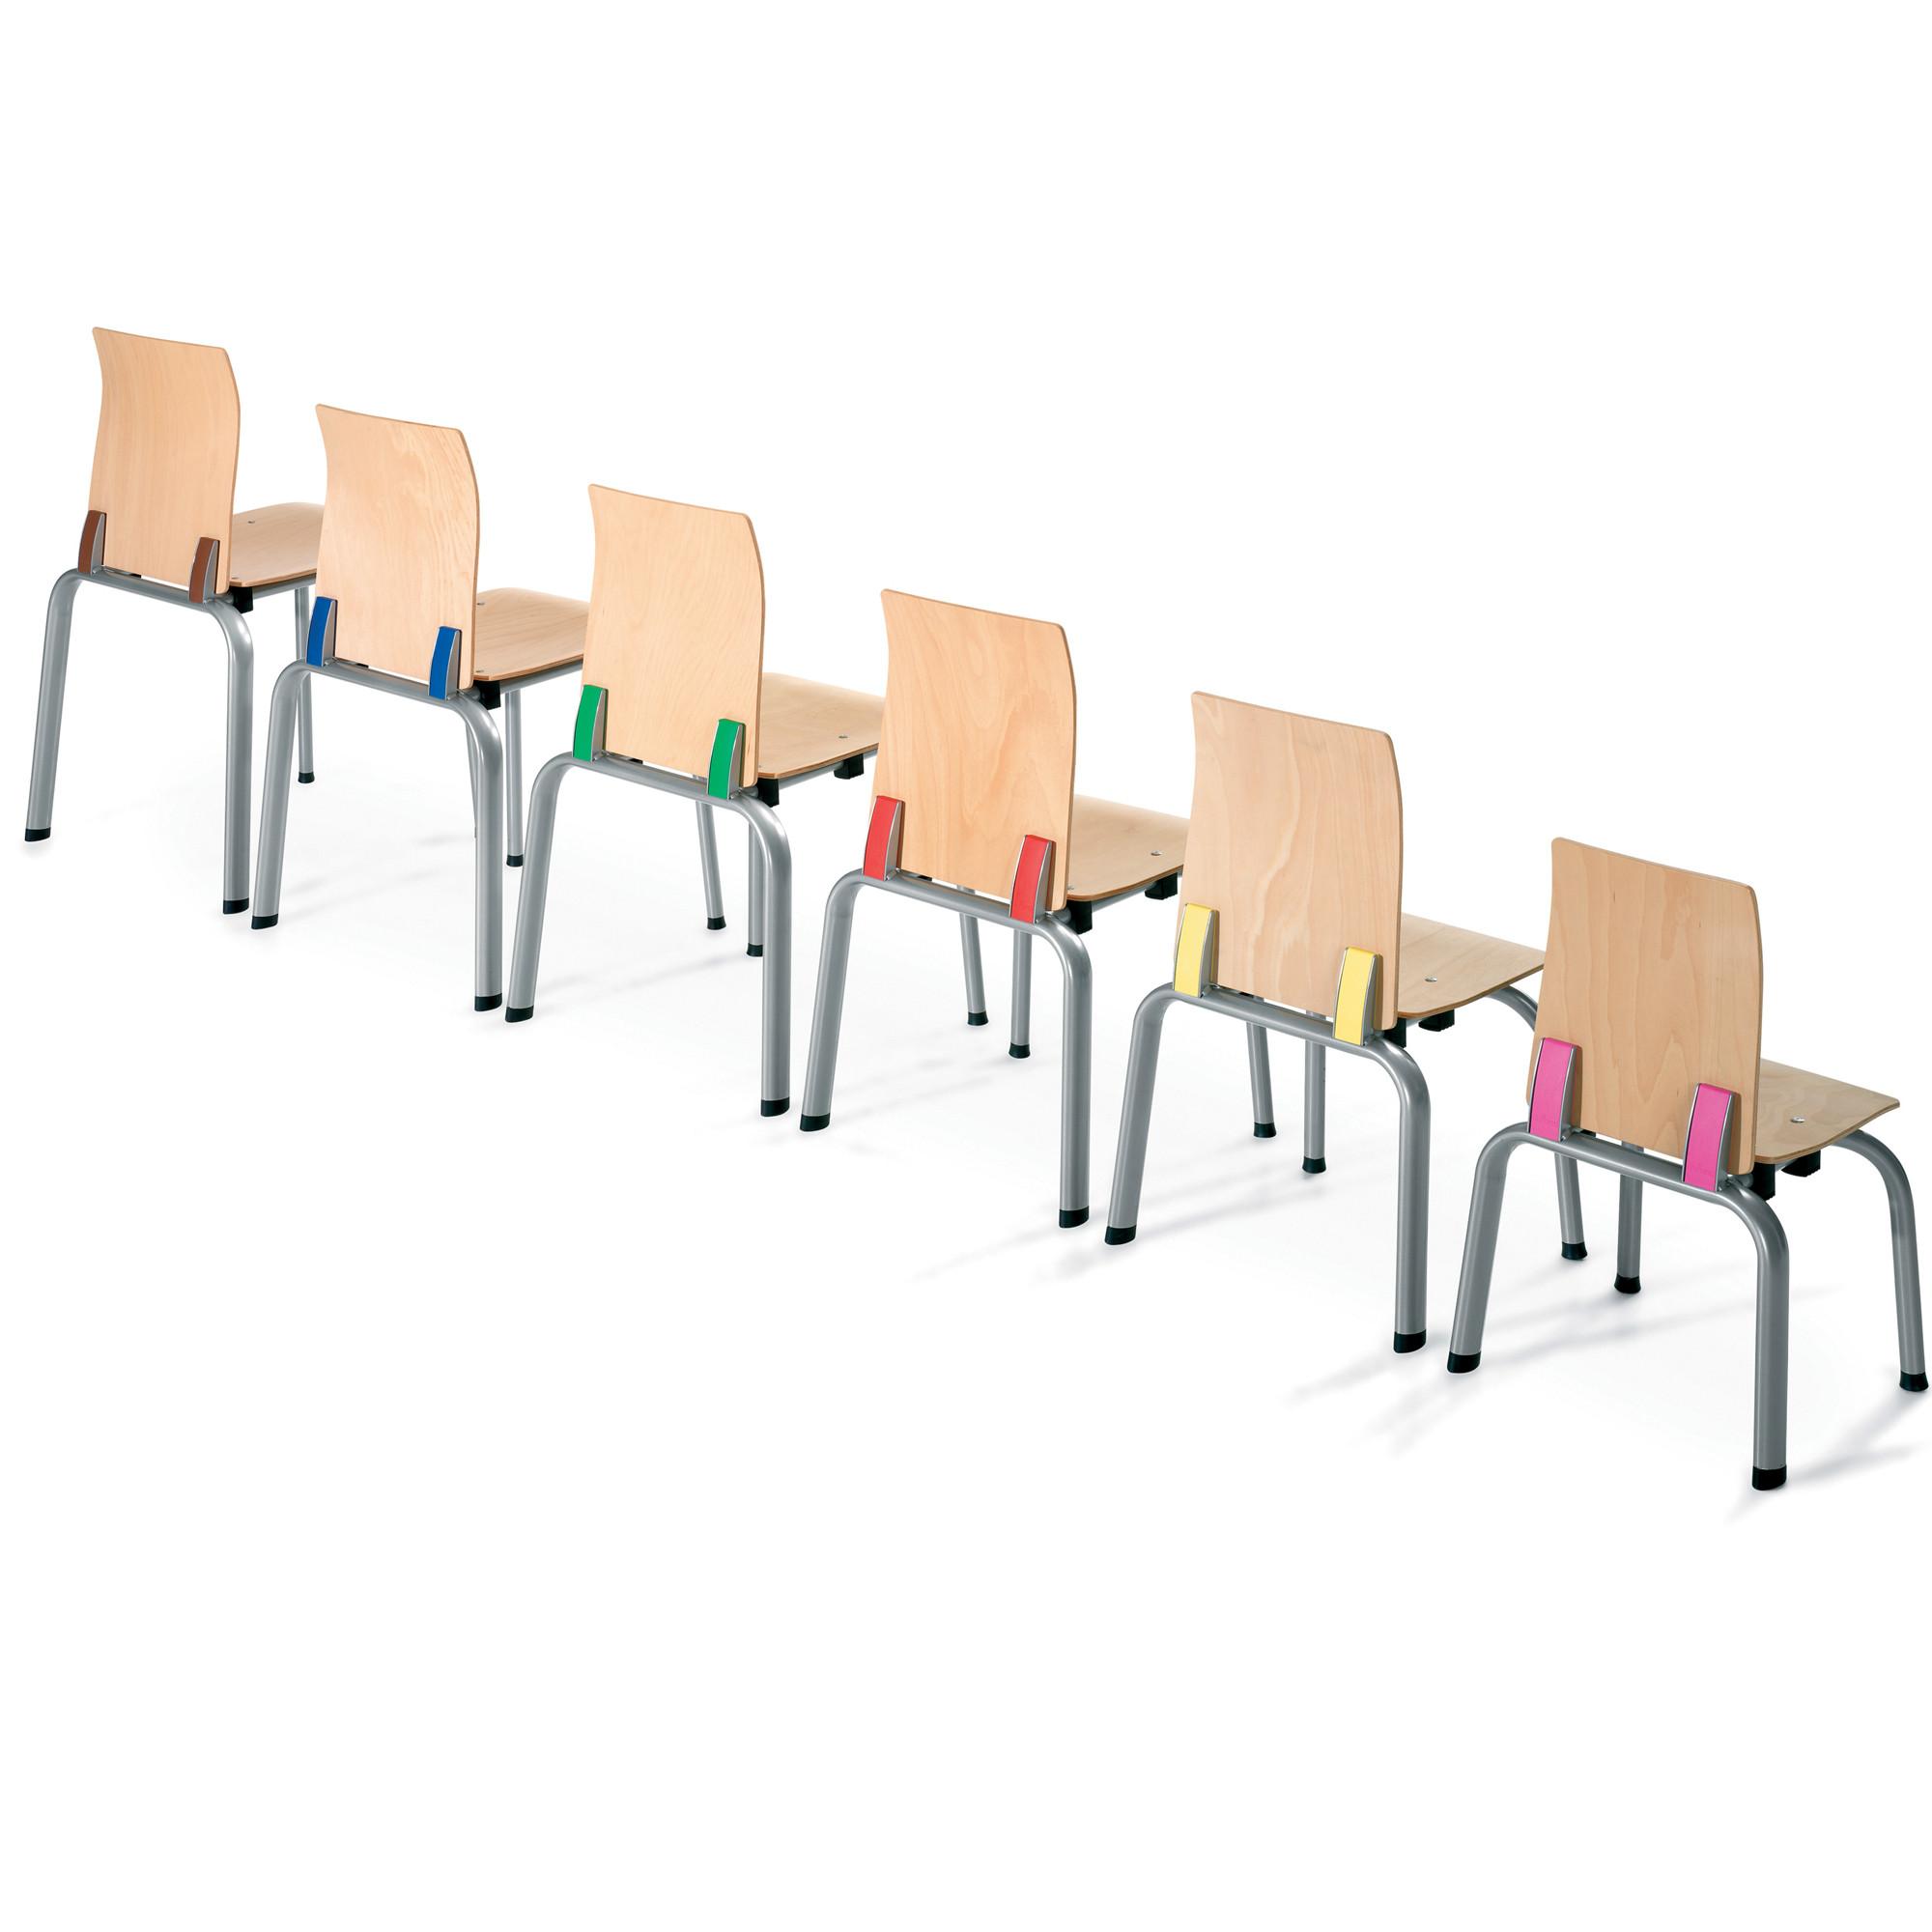 Ahrend 452 School Furniture